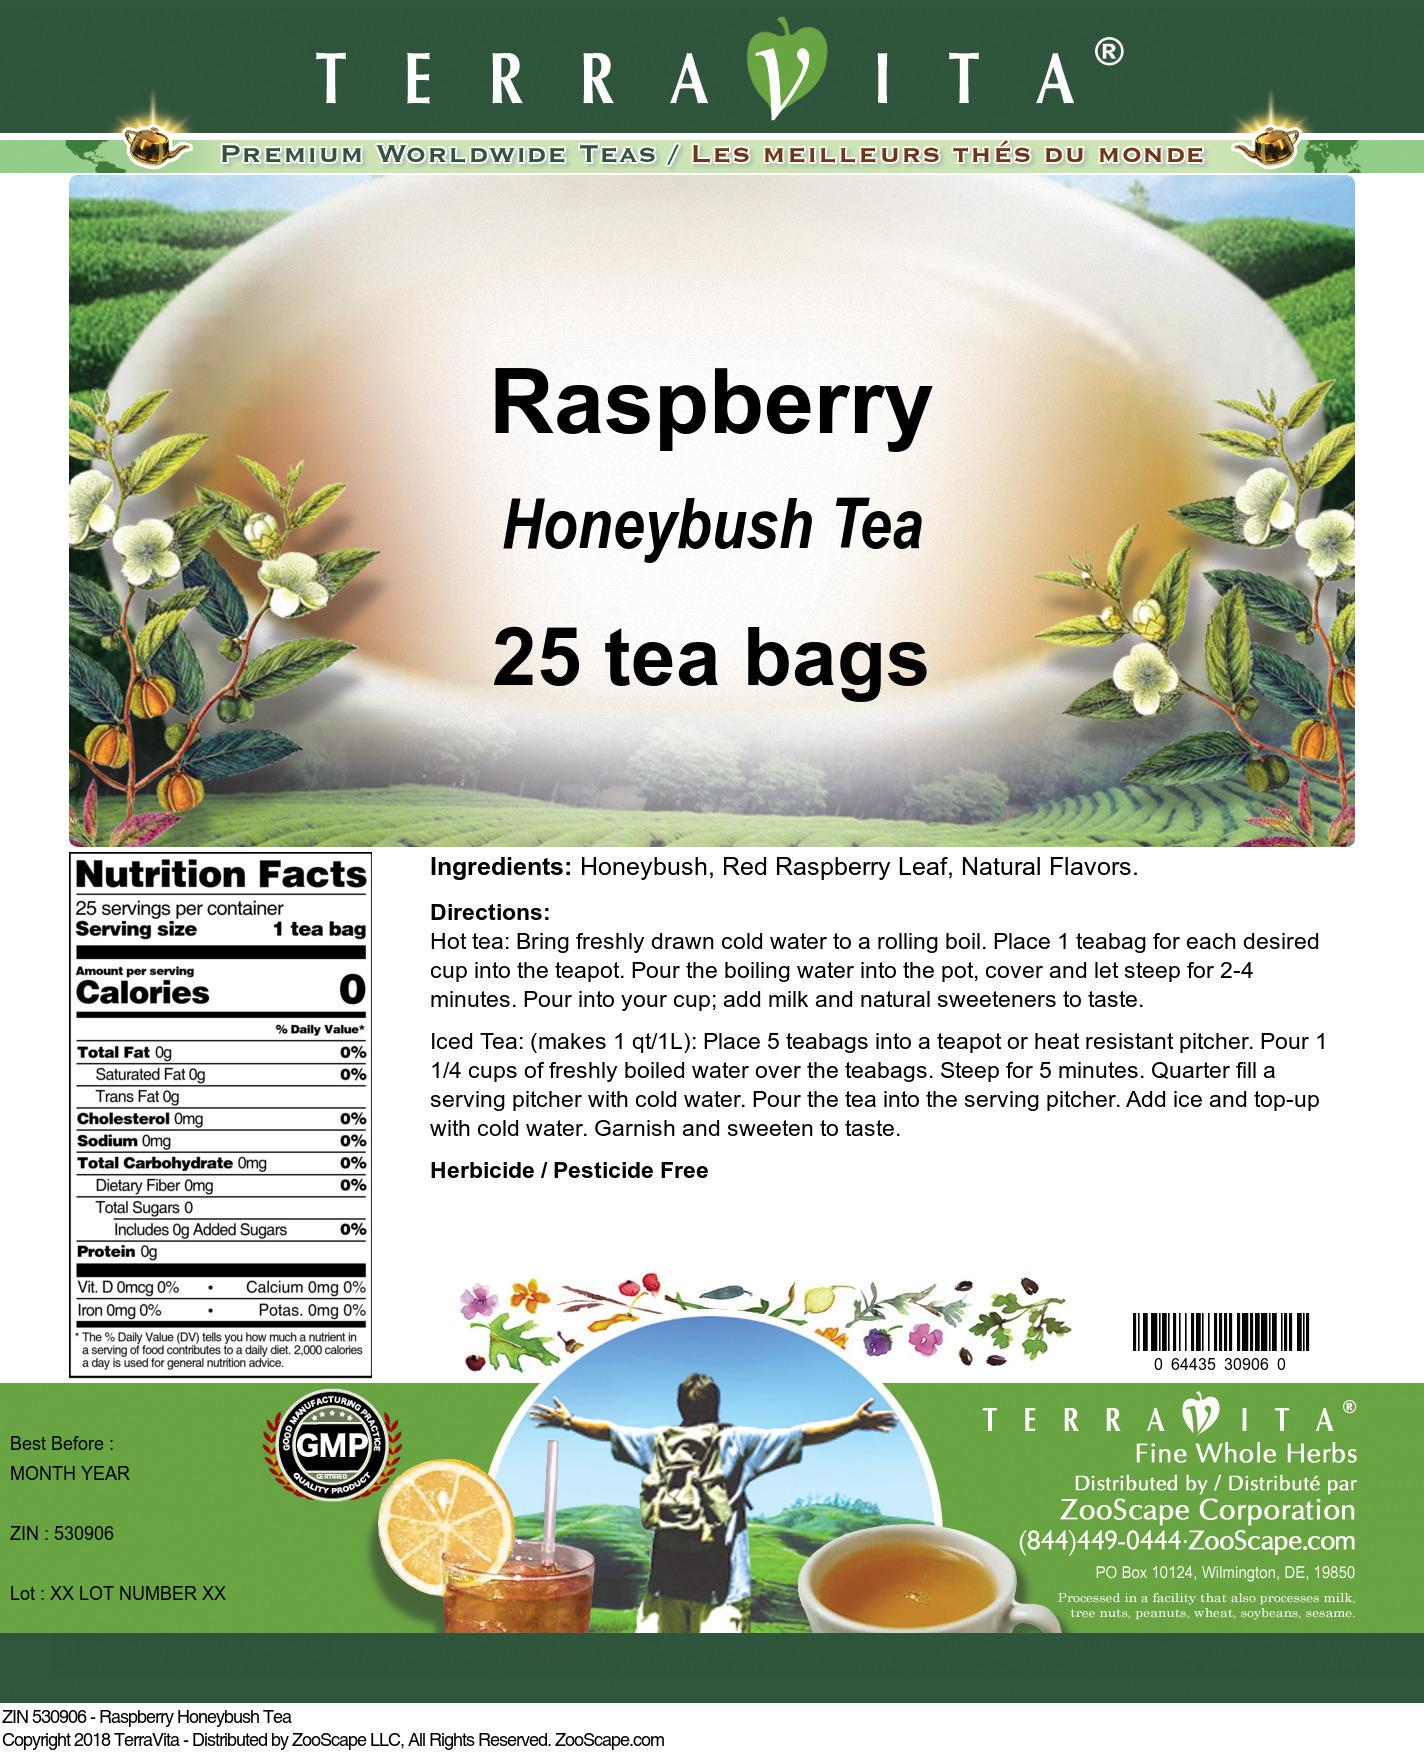 Raspberry Honeybush Tea